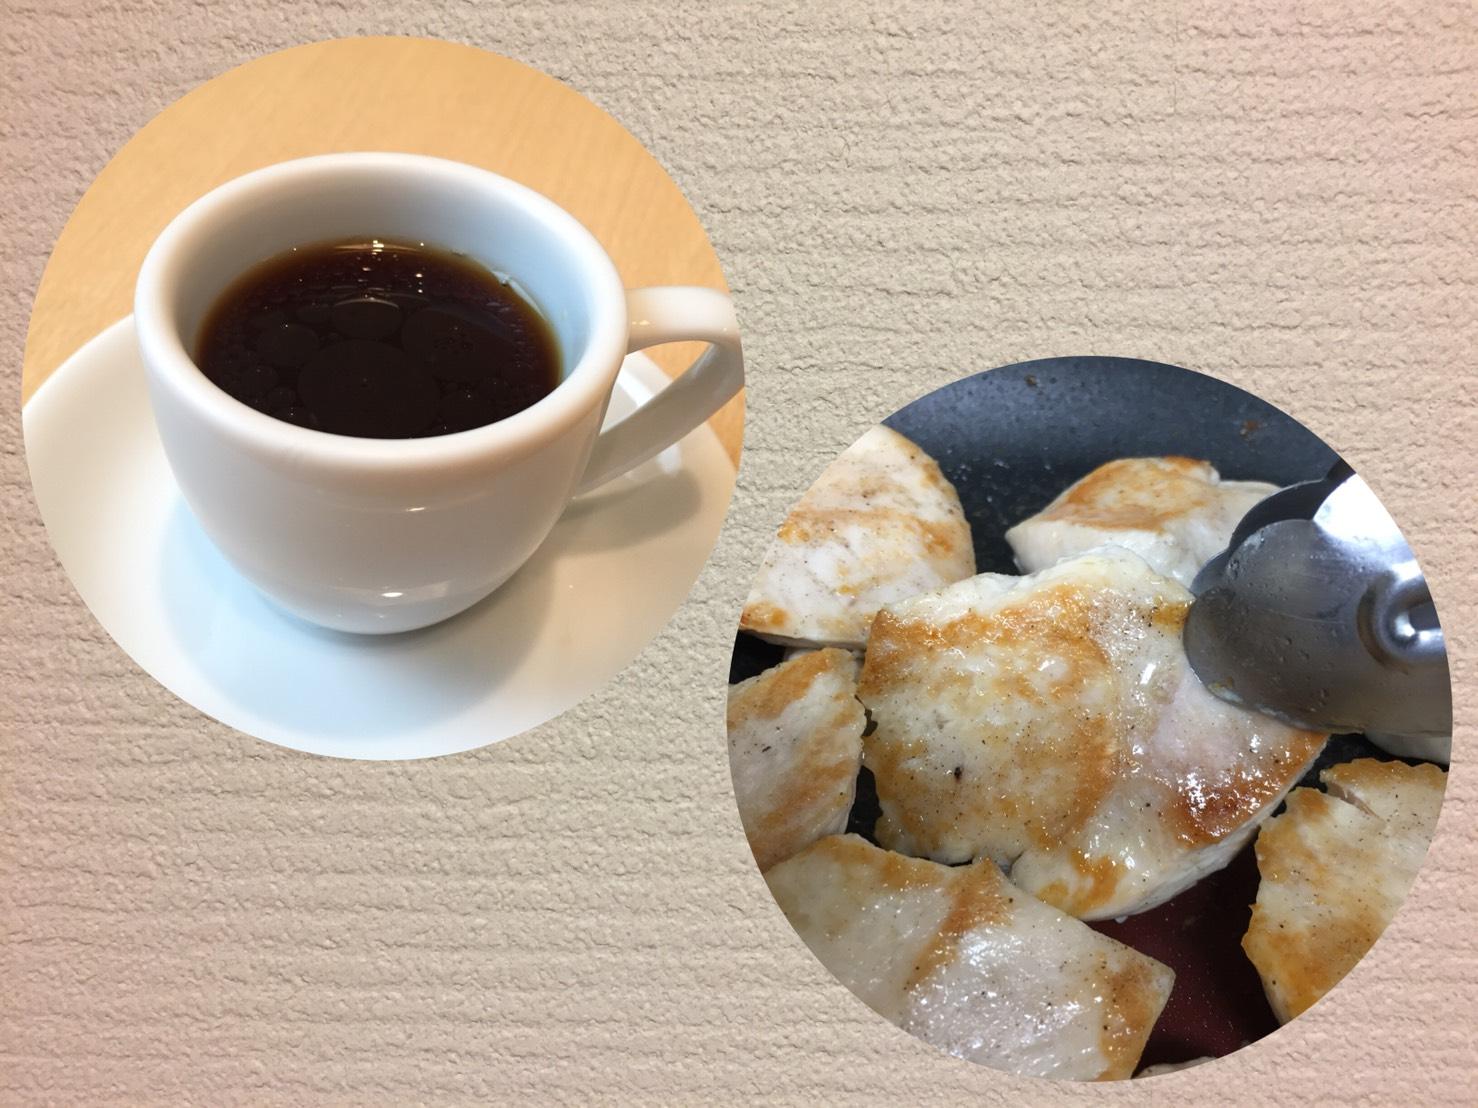 COCONPURE(ココンピュア)の使用方法【コーヒーに加える、料理油として利用、保湿美肌効果の検証】